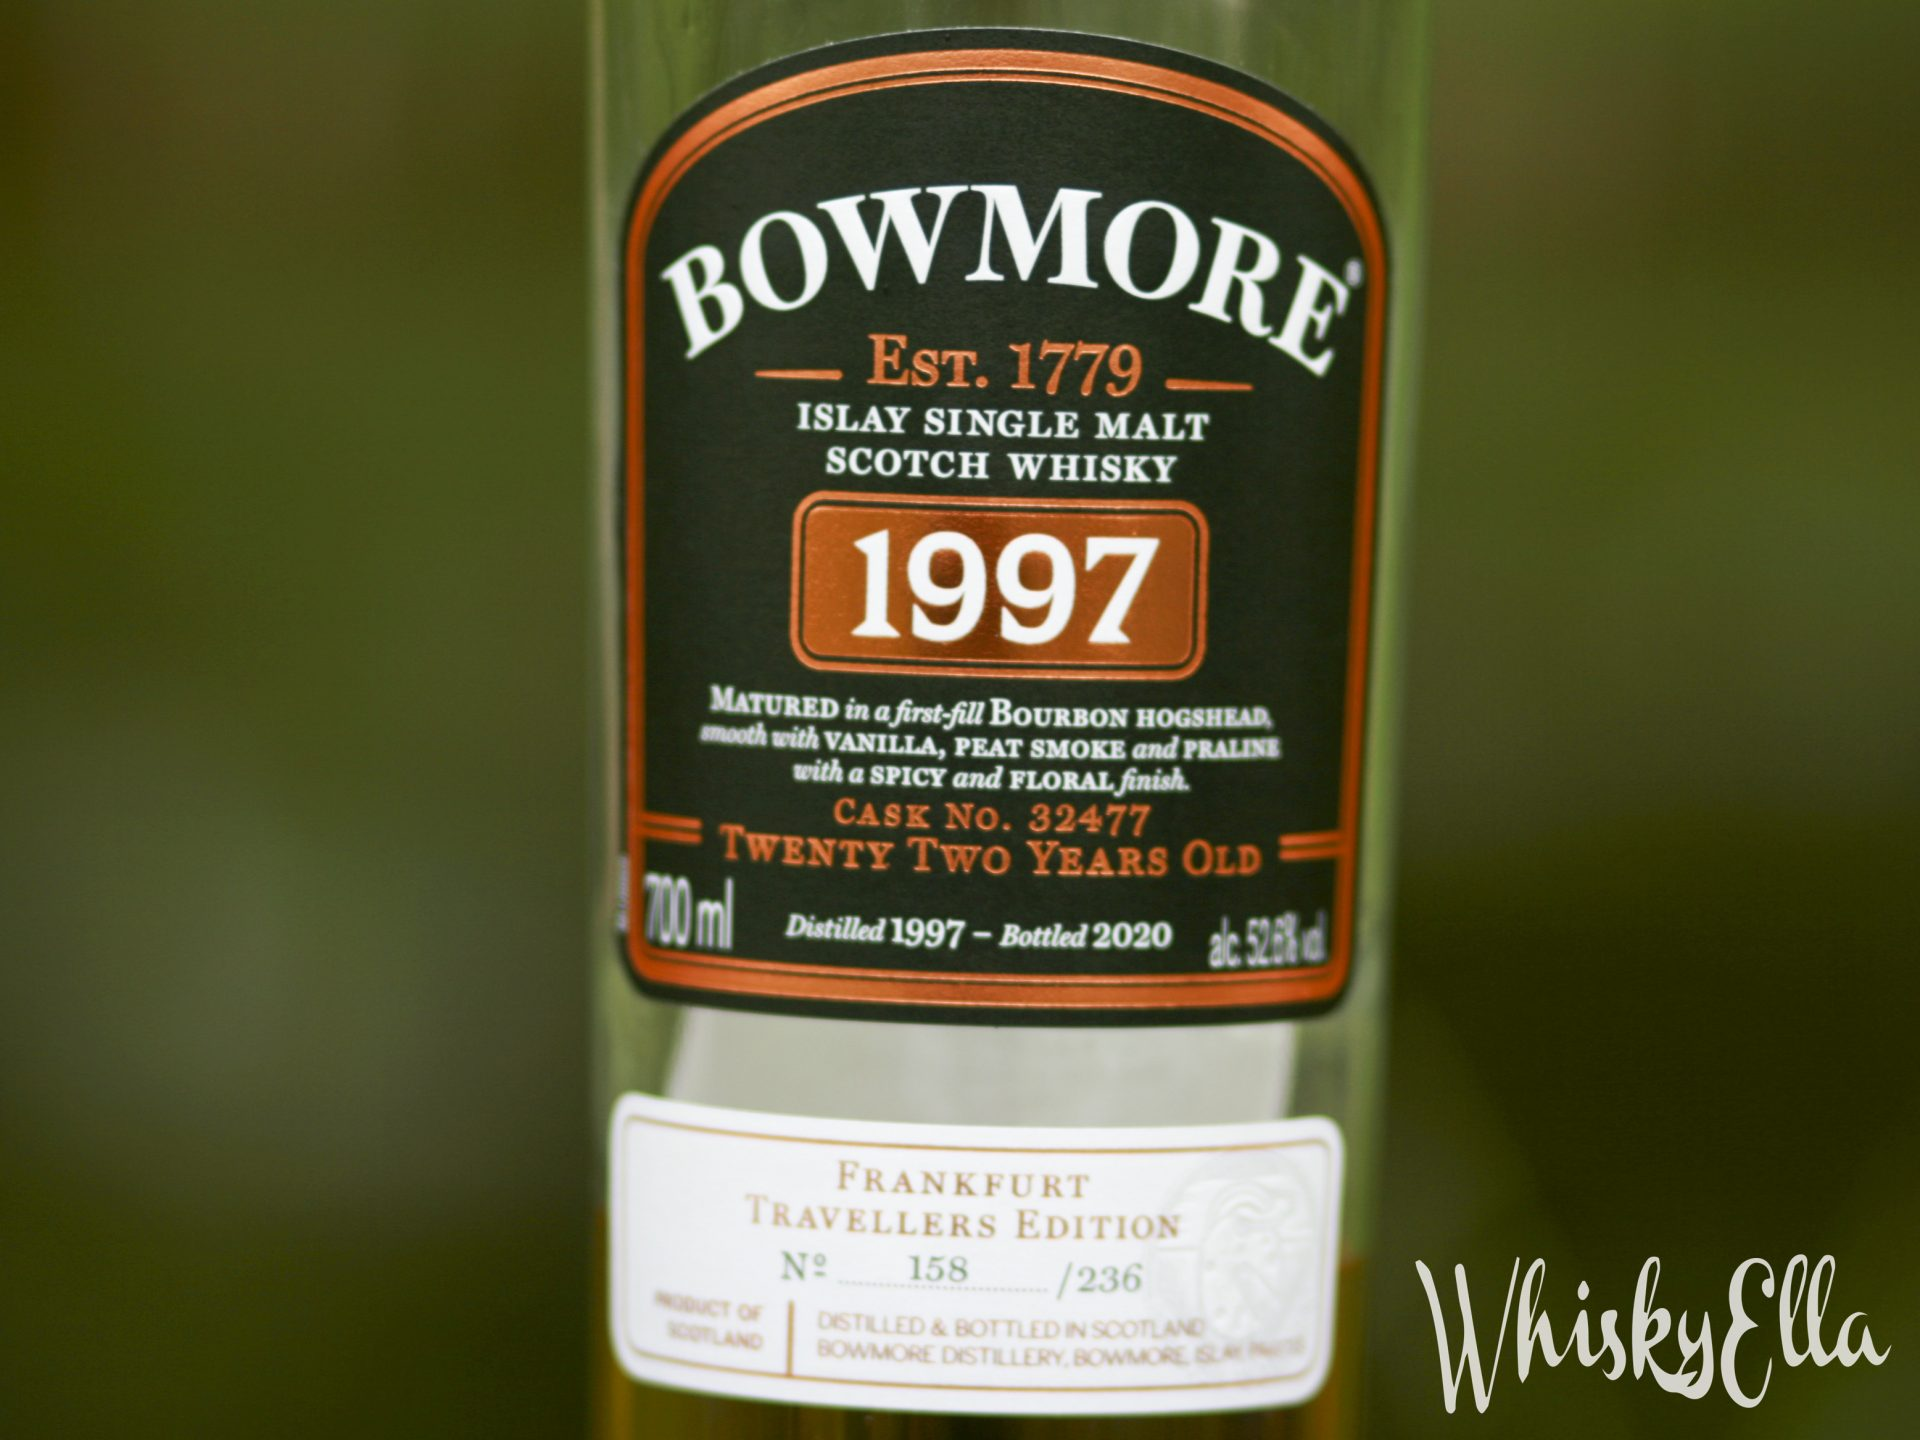 Nasza recenzja Bowmore 1997 22yo Frankfurt Travellers Edition #109